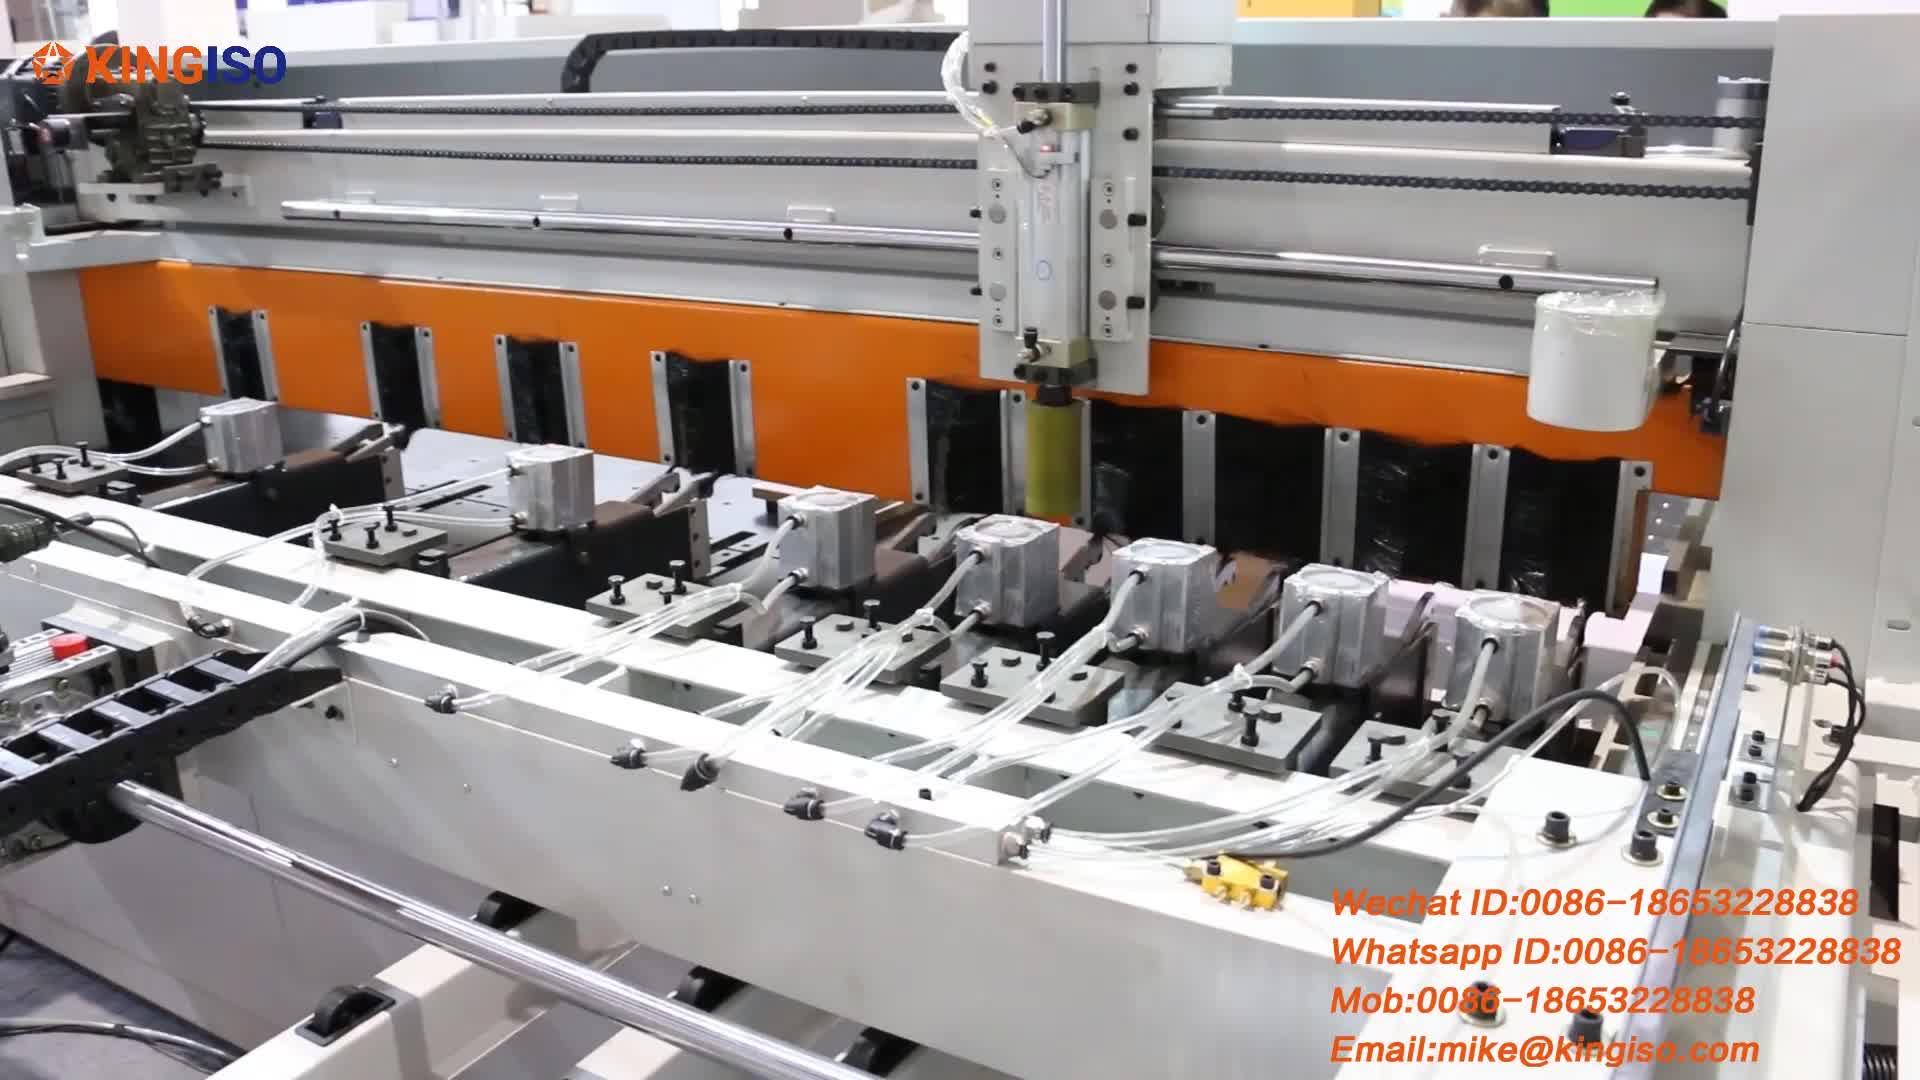 Hoge efficiëntie computer beam zag machine automatische voeden CNC Panel Saw prijs